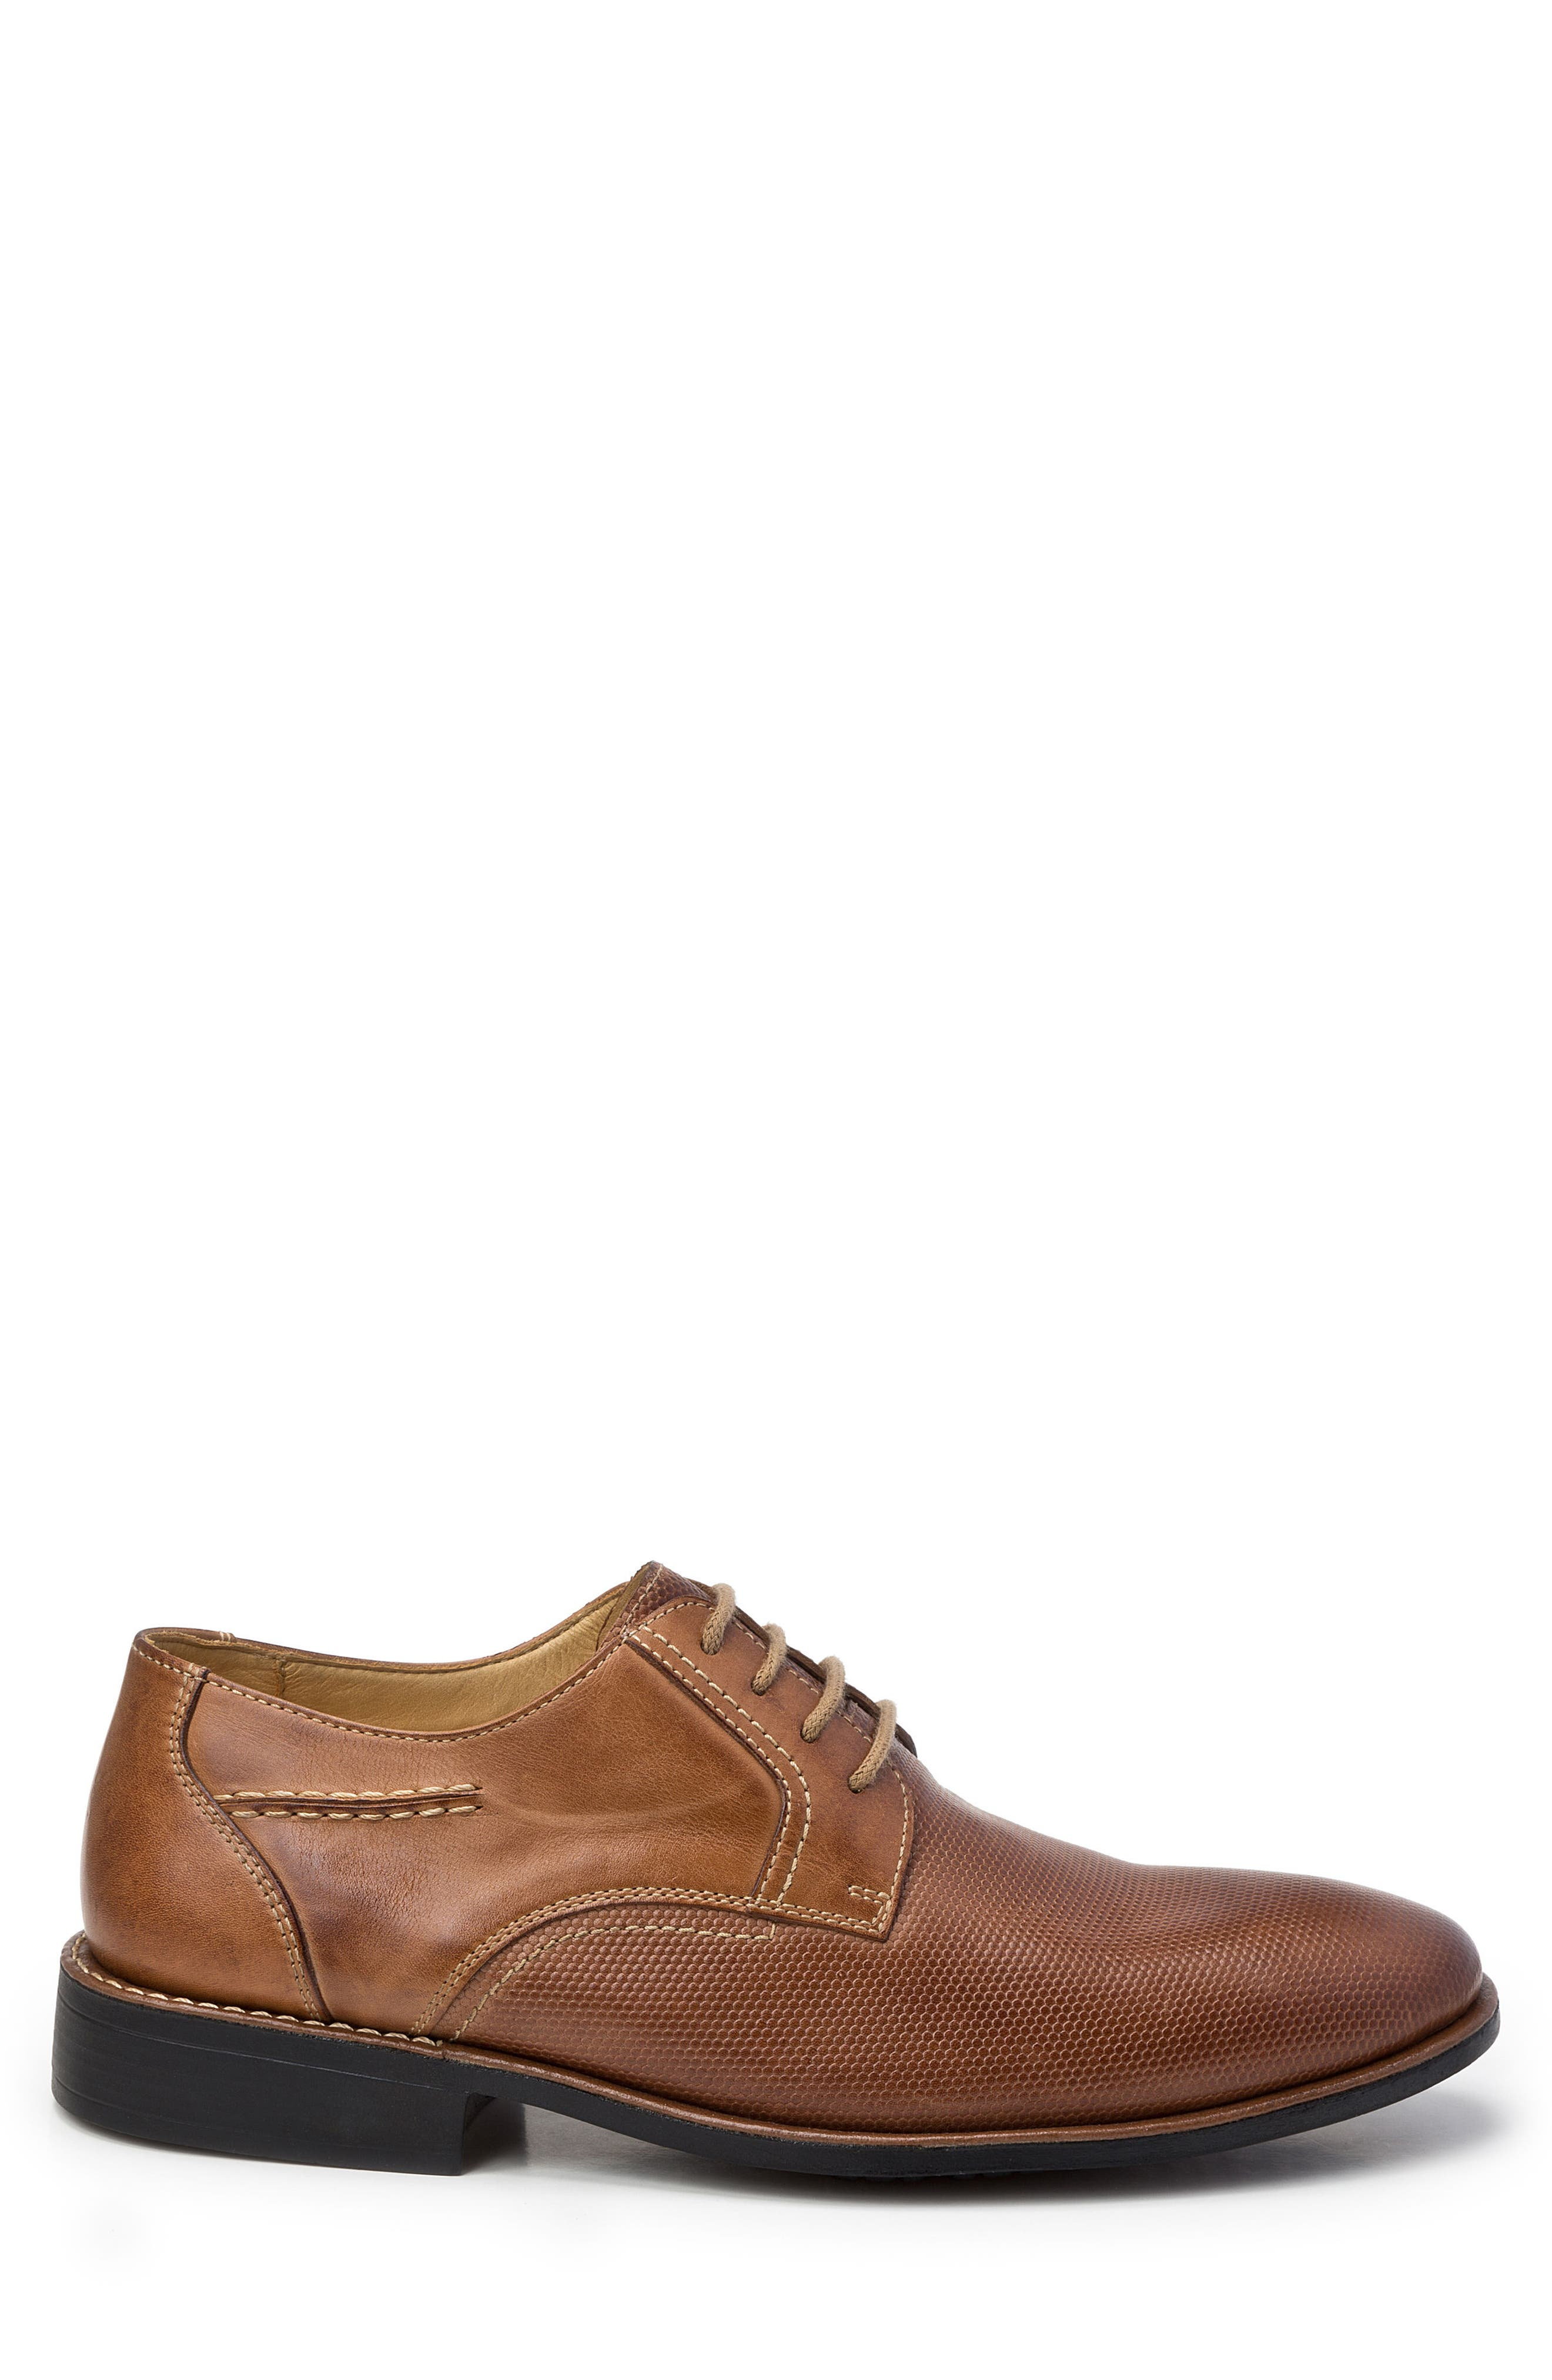 Trenso Plain Toe Derby,                             Alternate thumbnail 3, color,                             Tan Leather